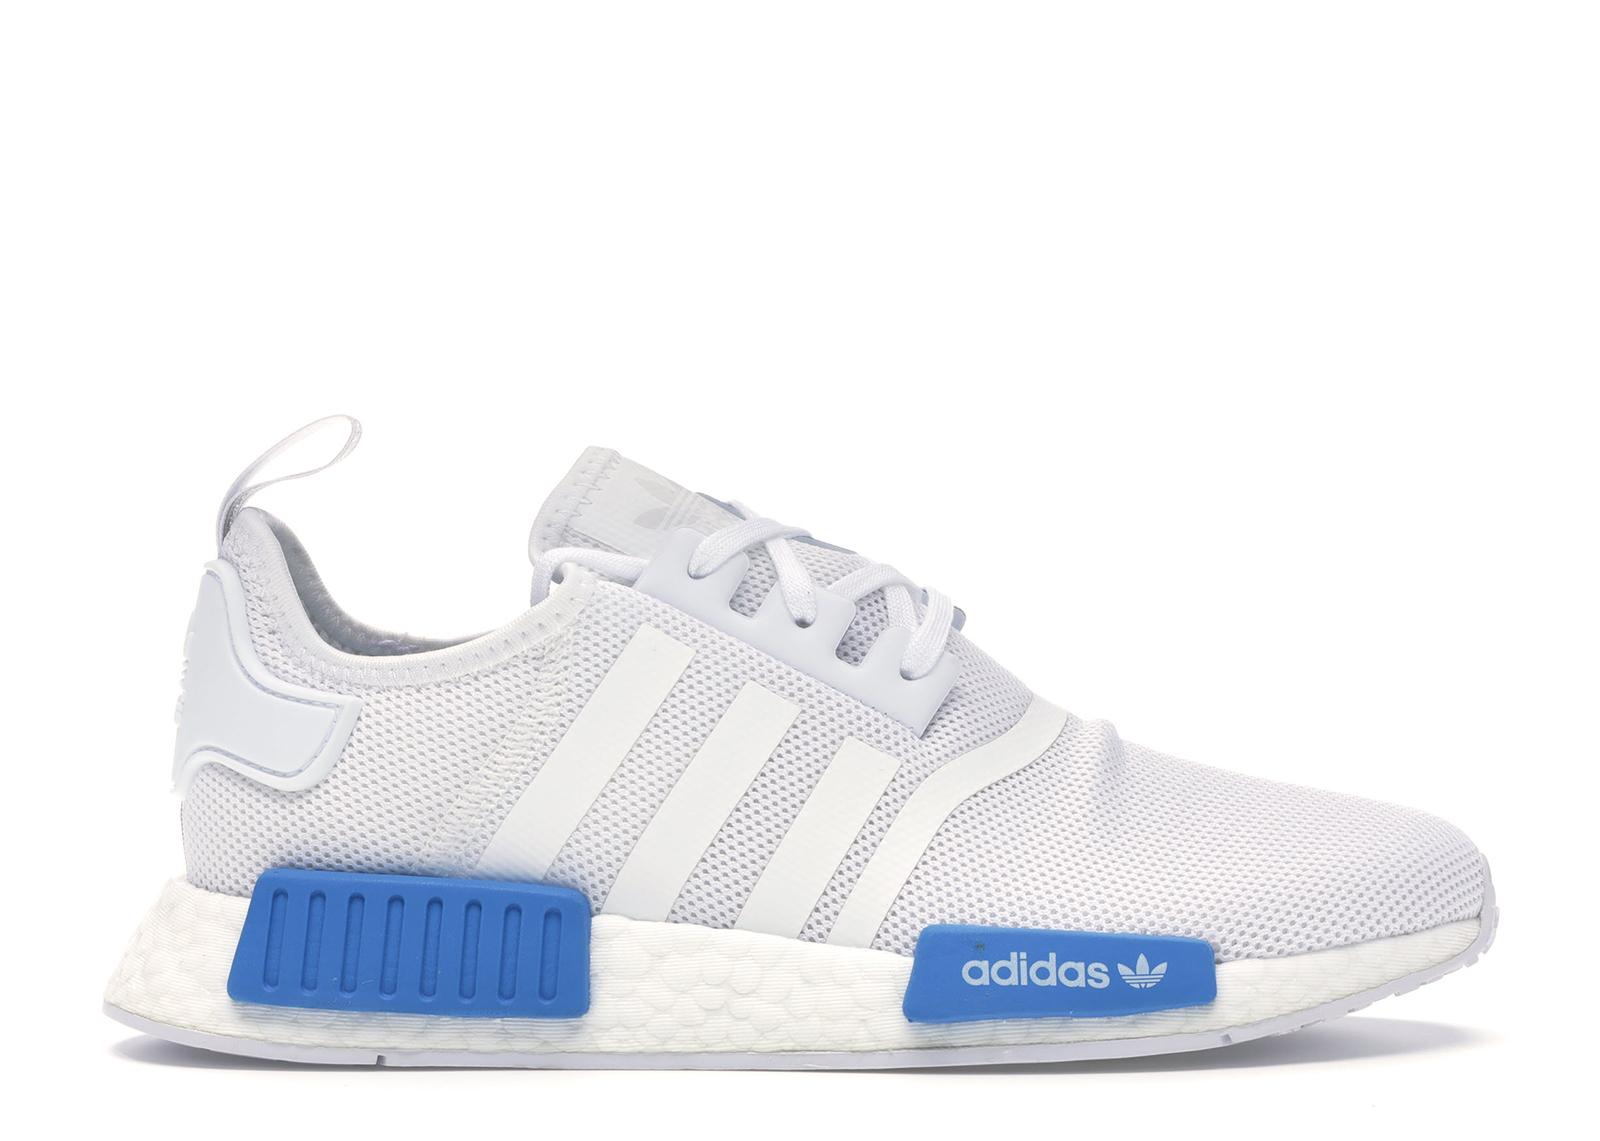 adidas NMD R1 Cloud White Bright Blue